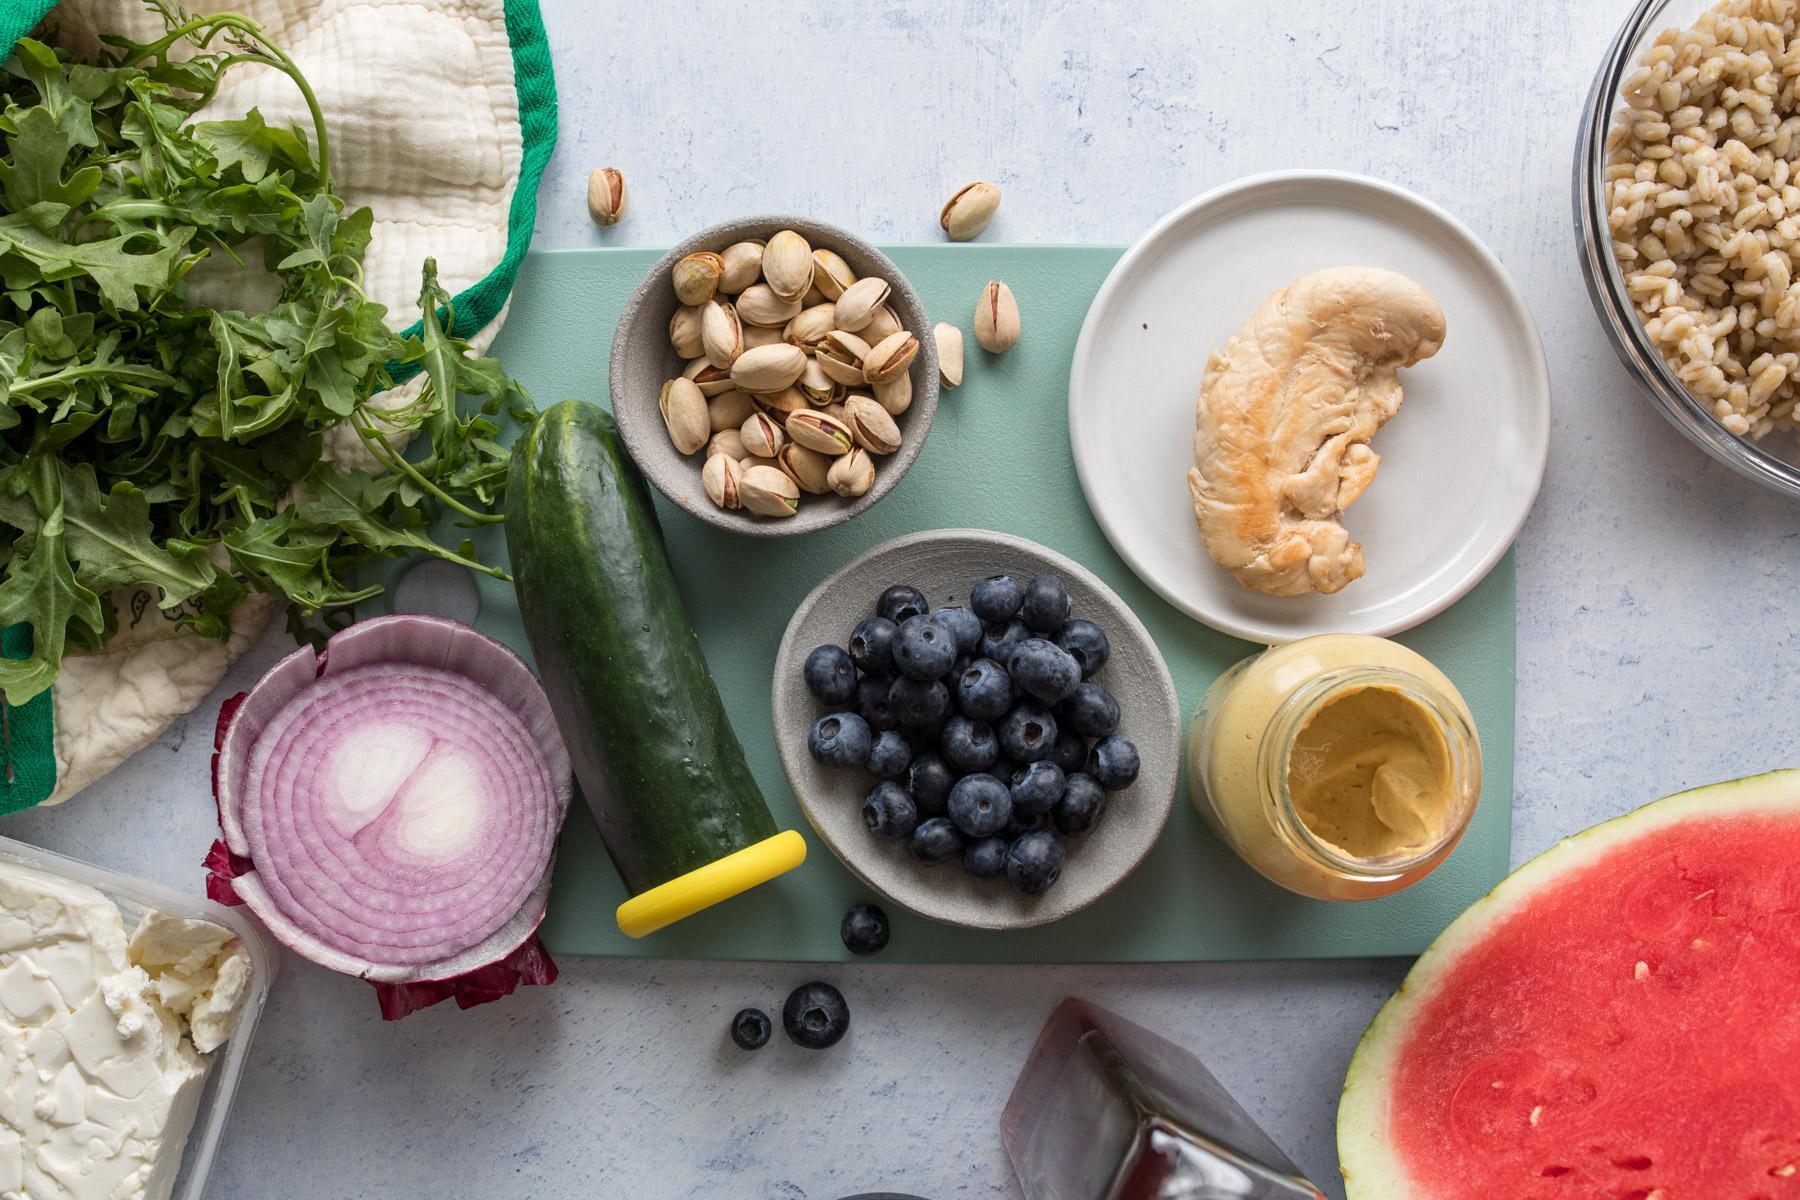 watermelon chicken salad ingredients on a cutting board